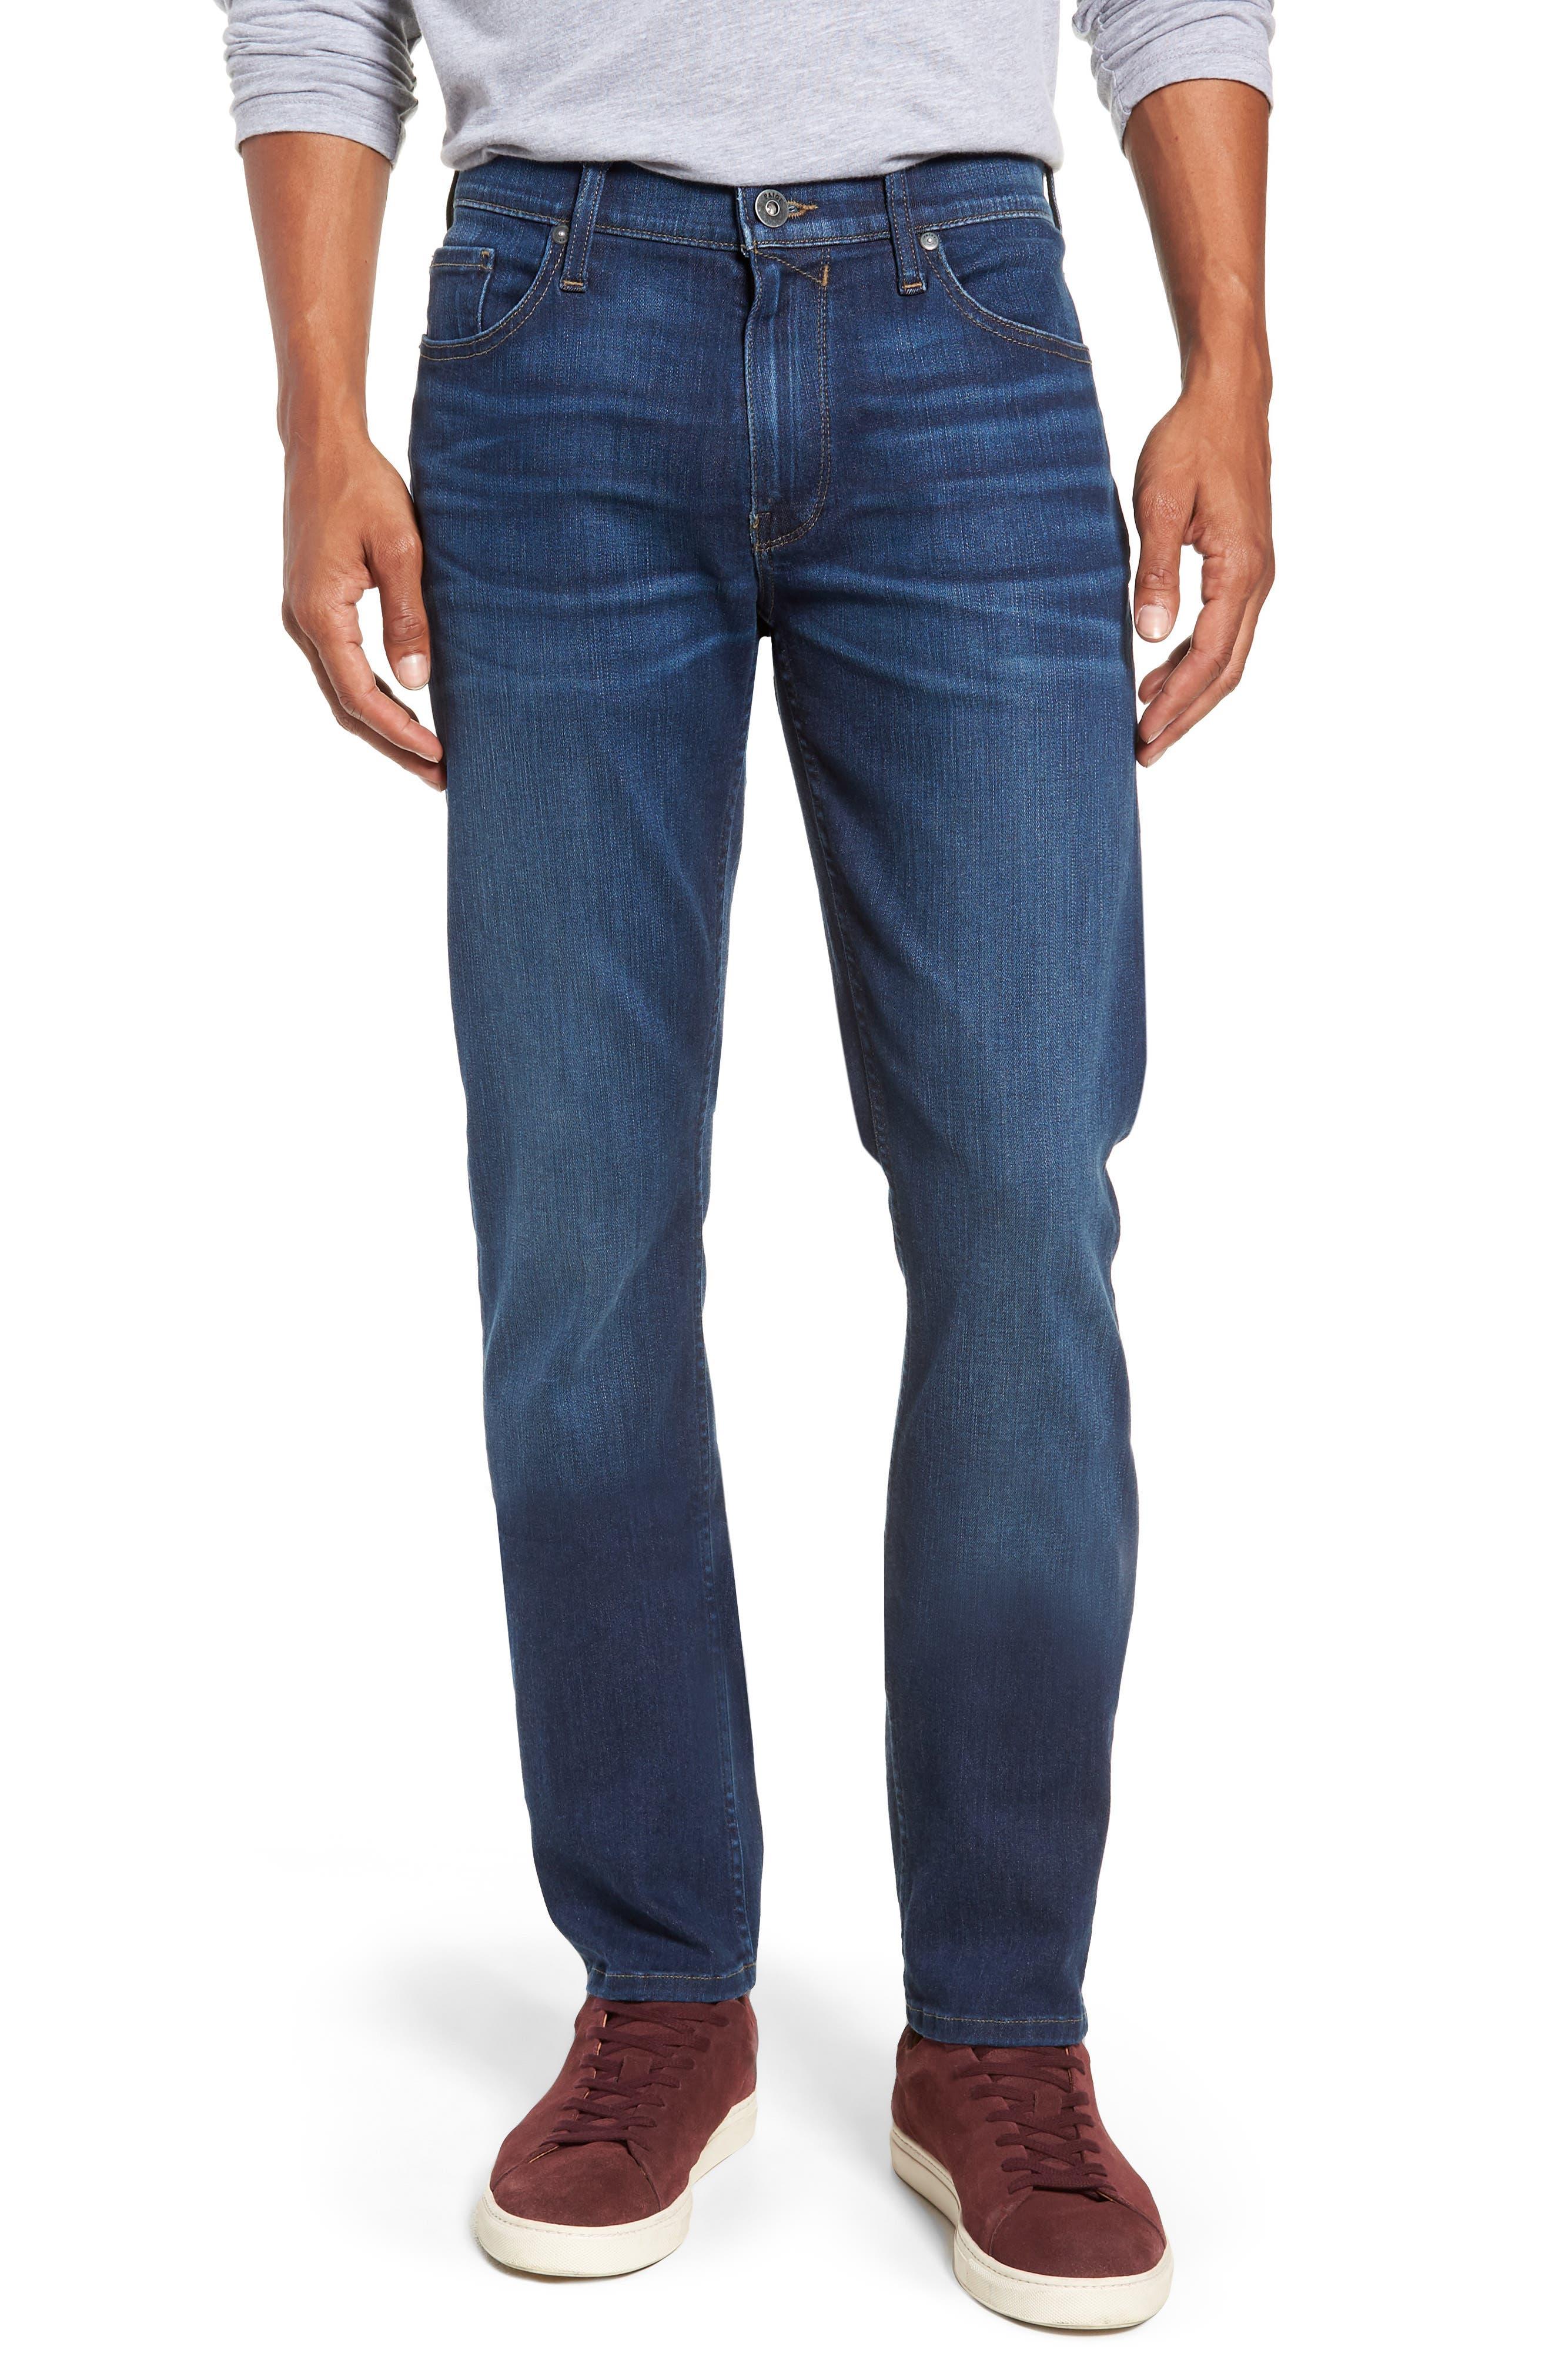 Transcend Vintage - Federal Slim Straight Leg Jeans,                             Main thumbnail 1, color,                             ELWYN